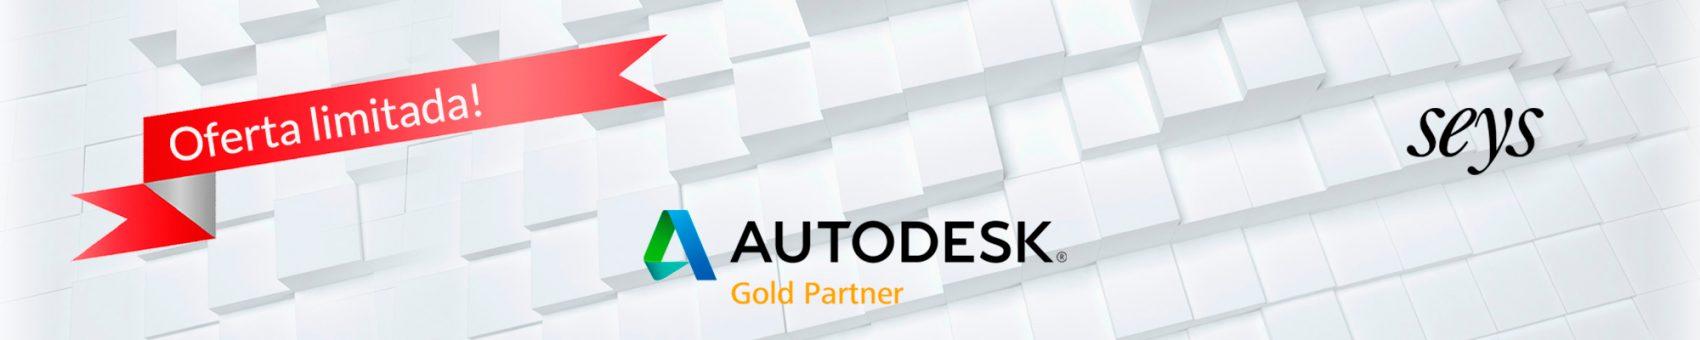 Oferta Autodesk Tienda Seystic